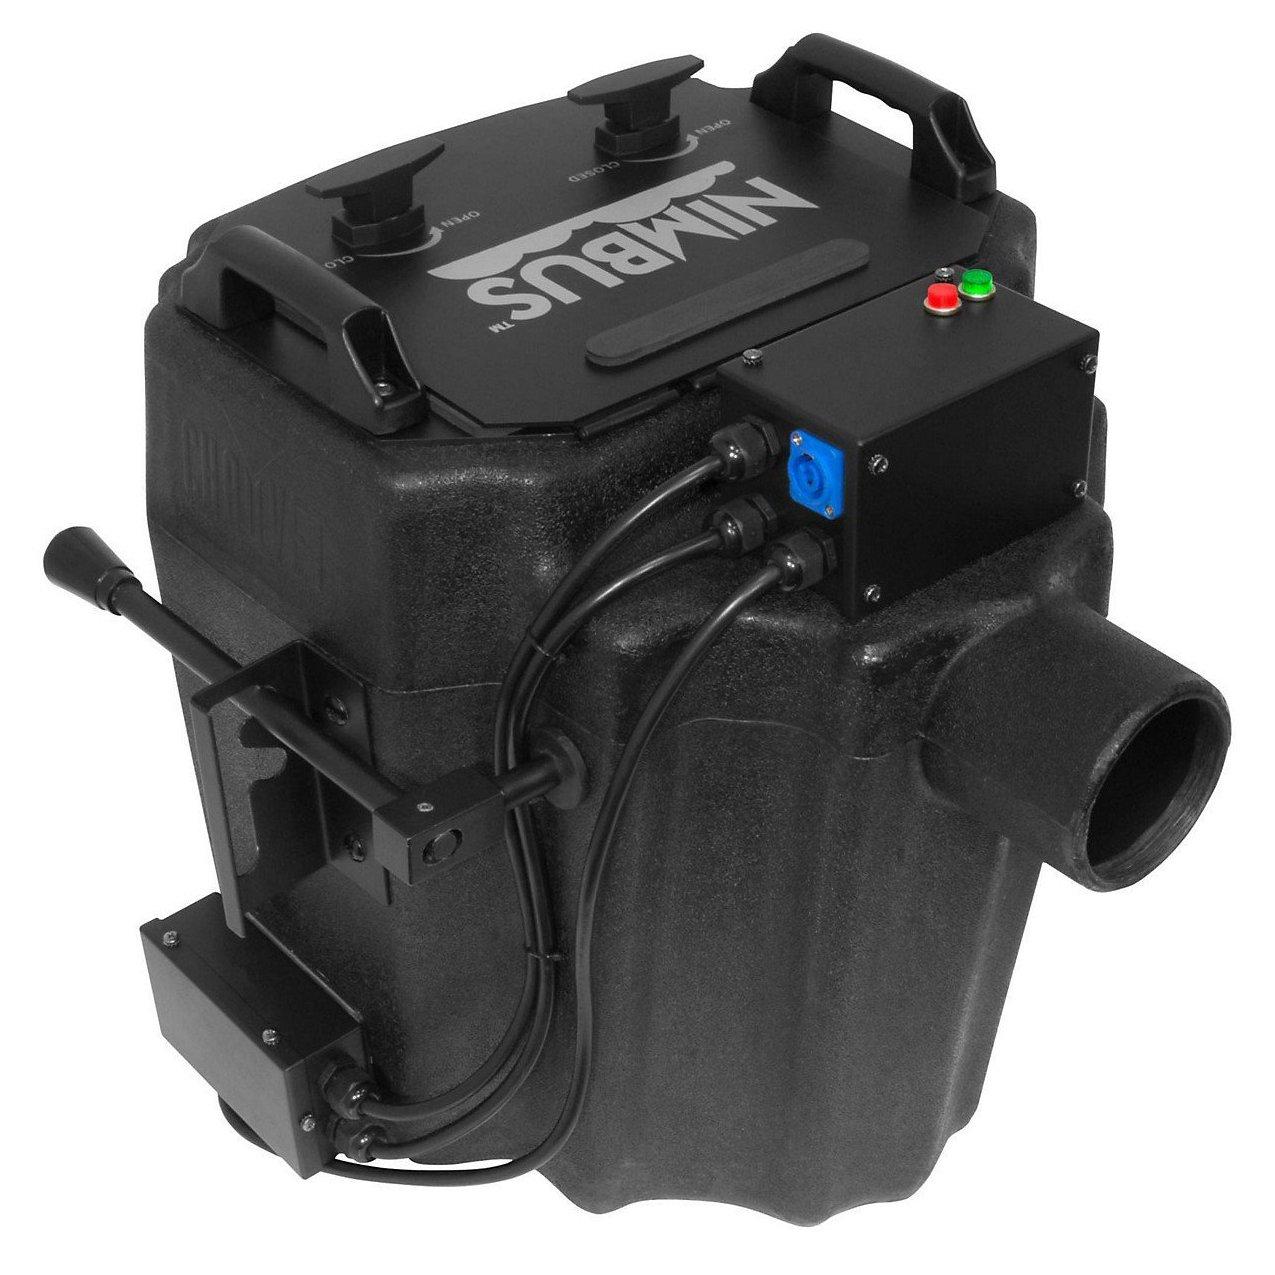 Chauvet DJ Nimbus Professional Dry Ice Low Lying Smoke Fog Machine Fogger